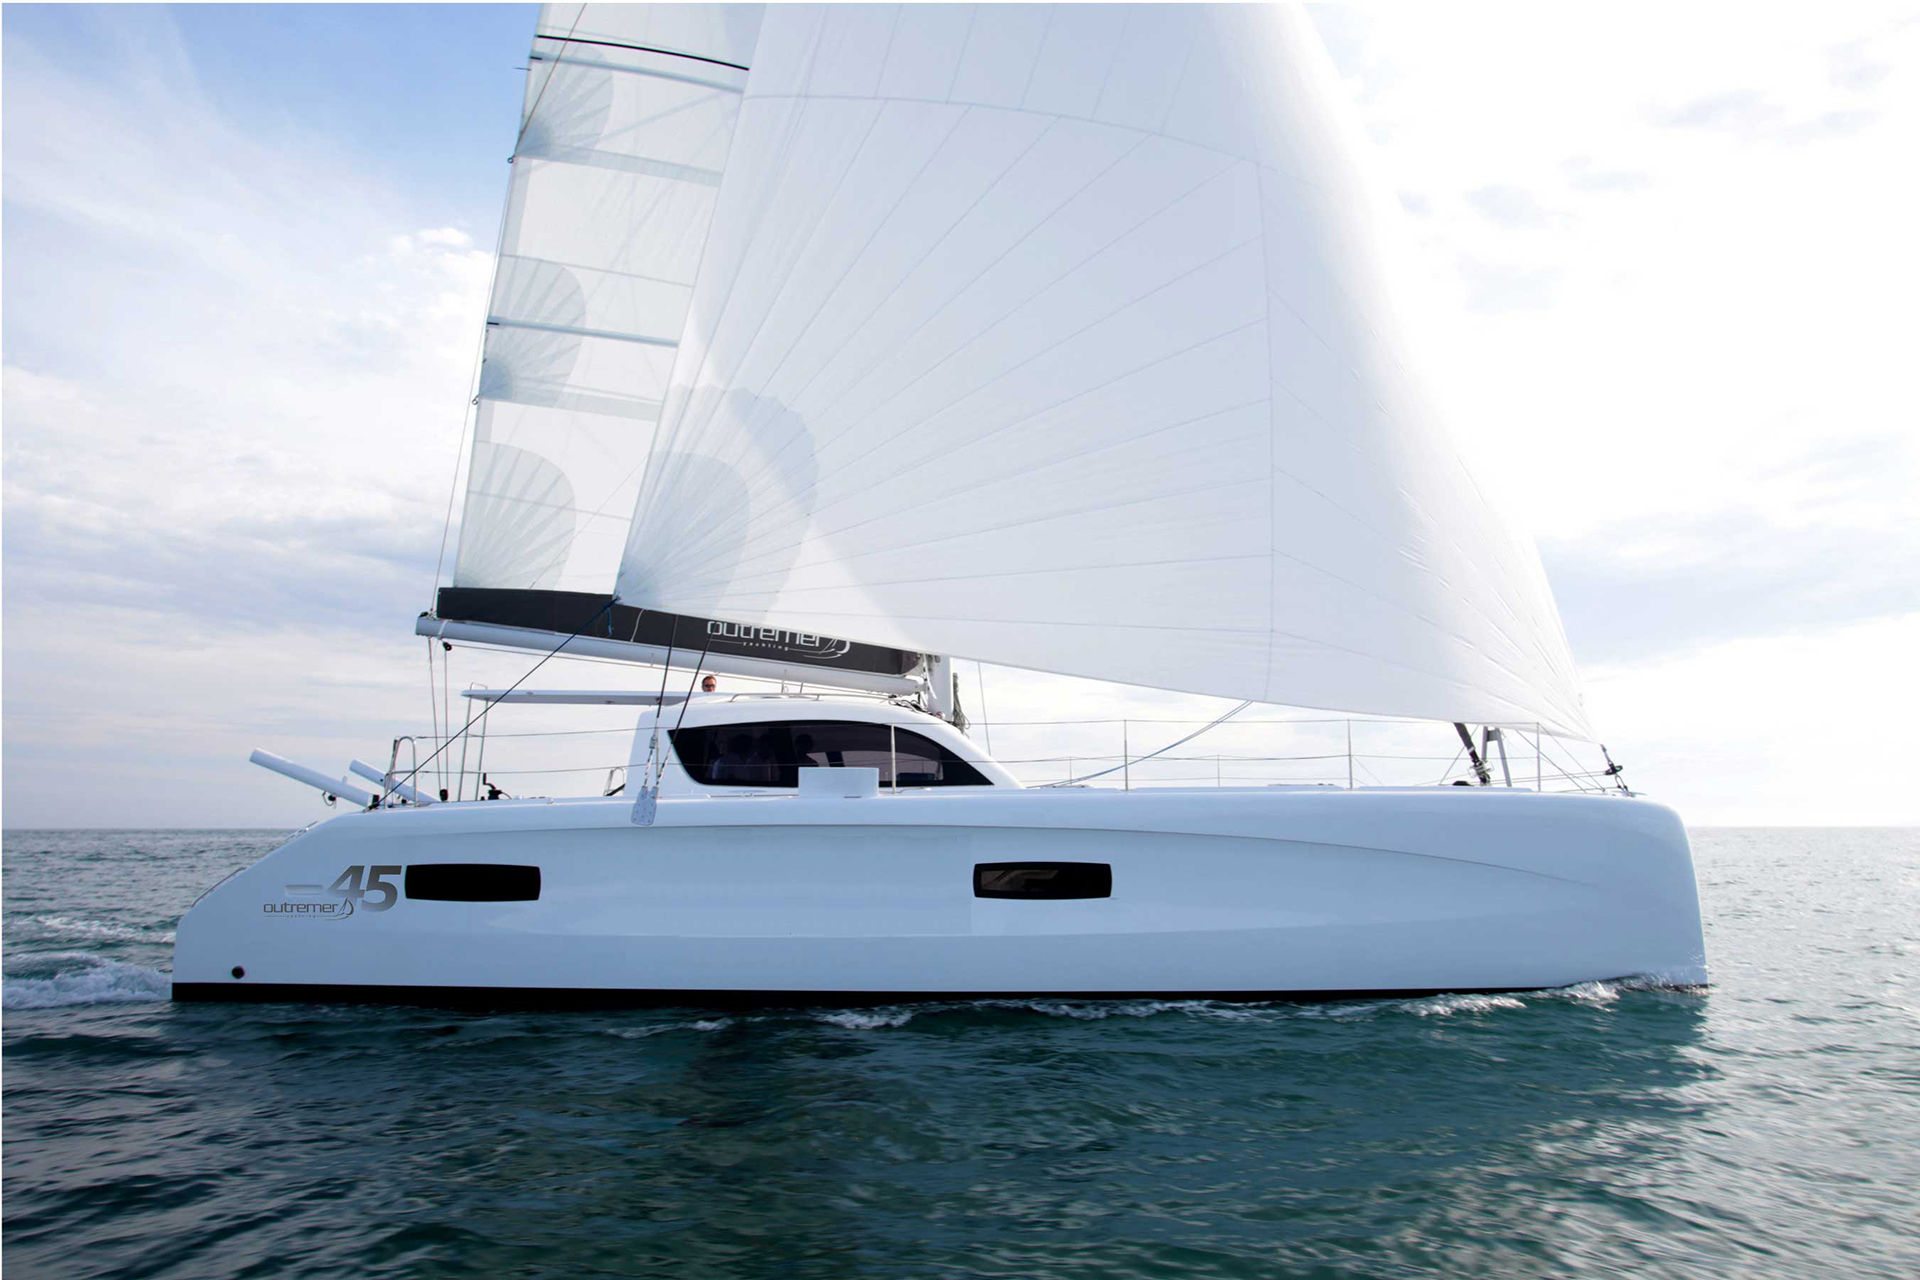 Outremer-45-catamaram for sale.jpg